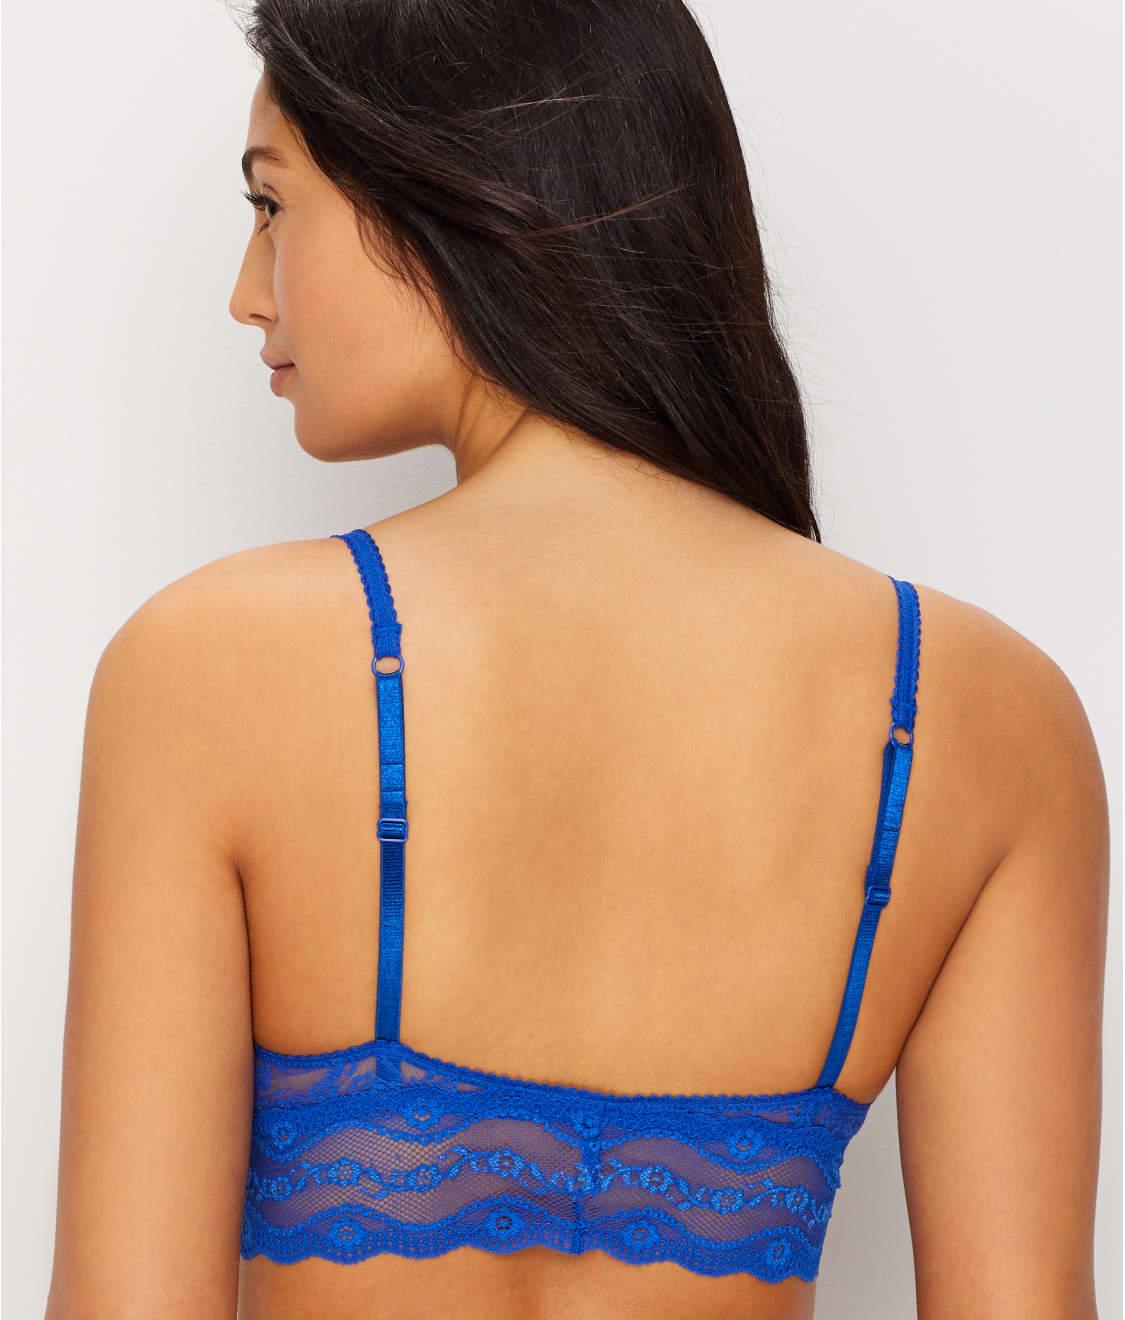 8c71b0fd631 b.tempt d by Wacoal Lace Kiss Bralette